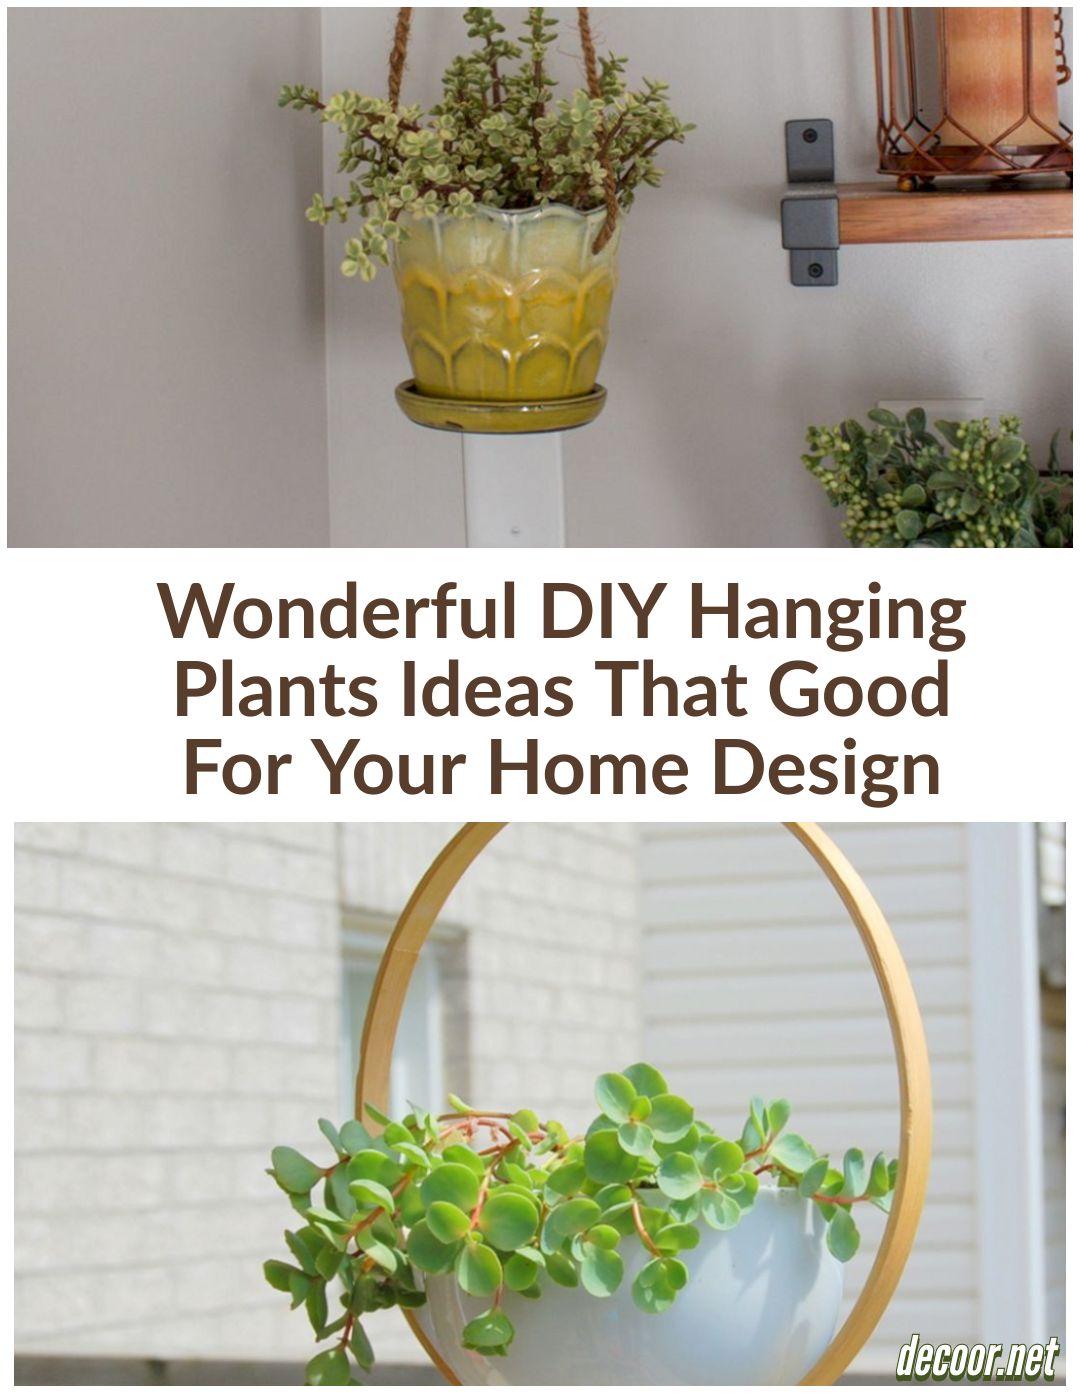 15 Wonderful Diy Hanging Plants Ideas